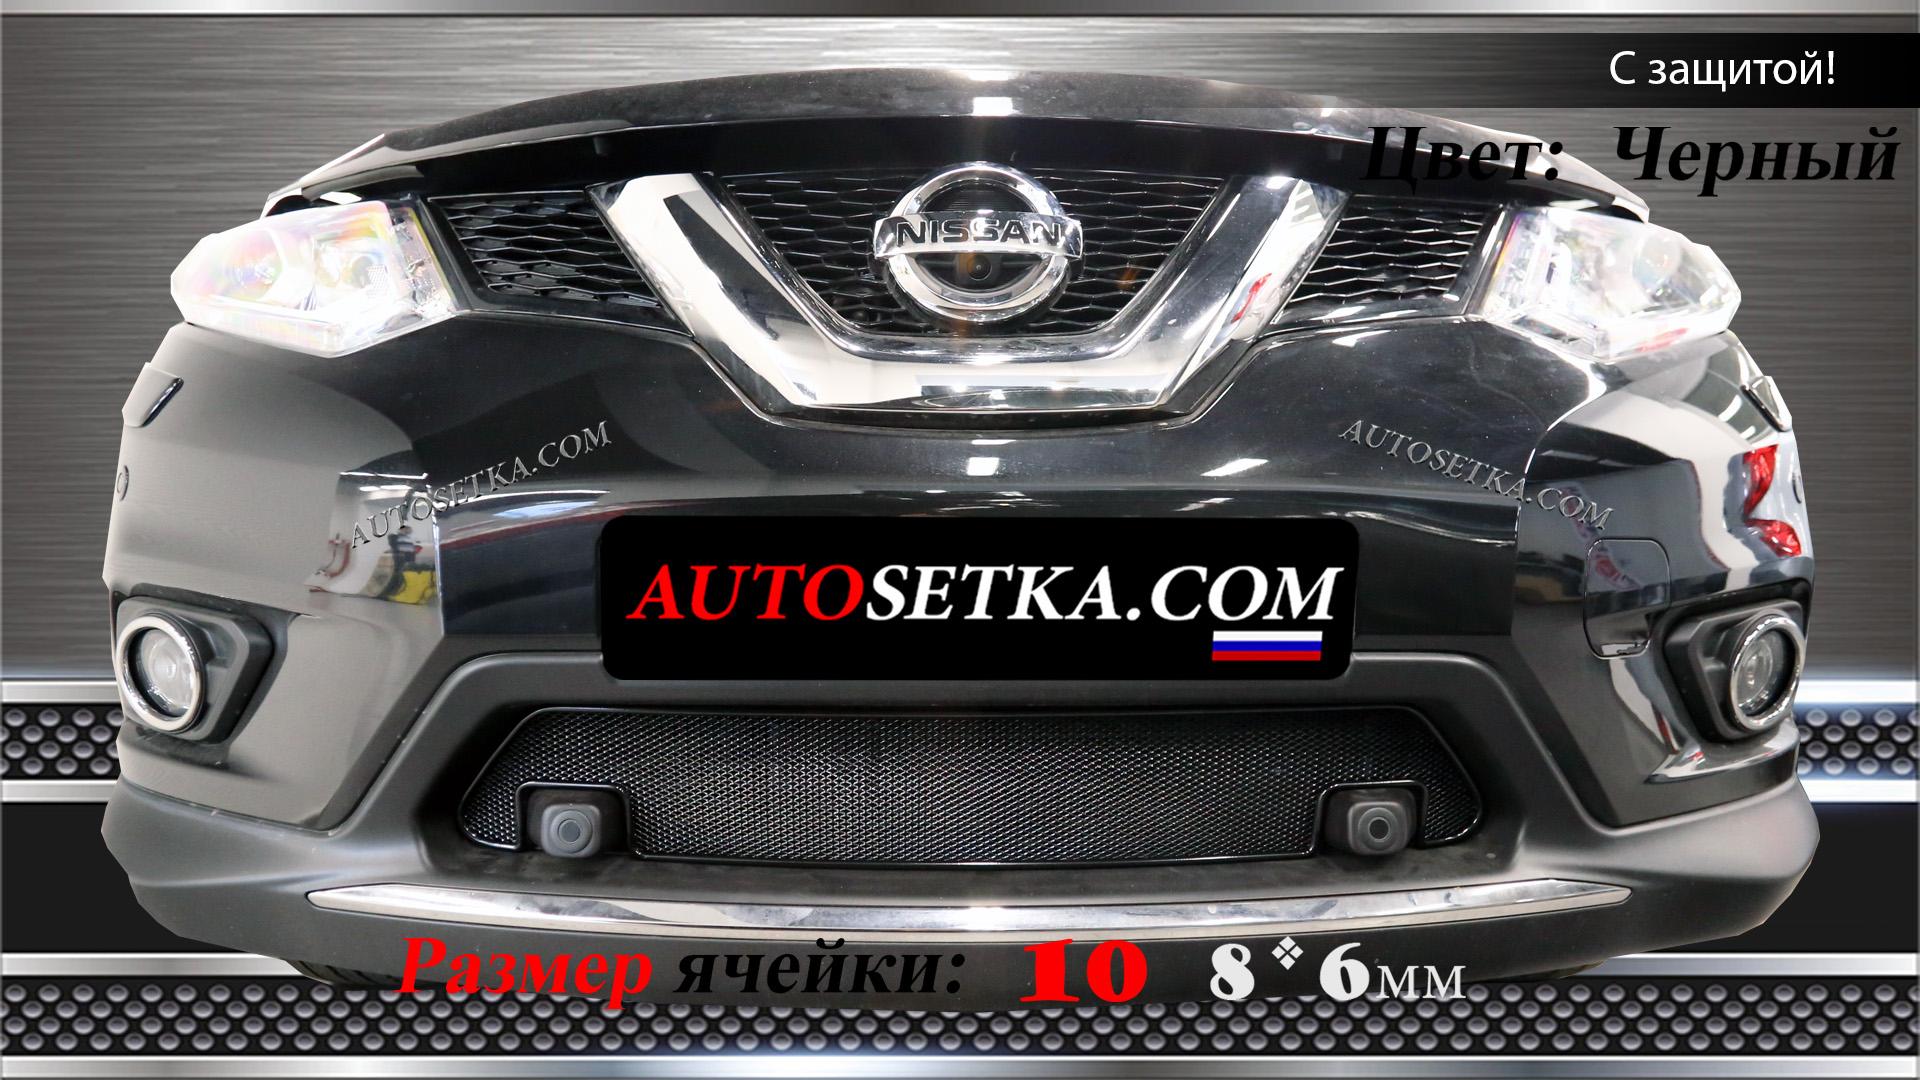 Nissan X-Trail 2015- 10 Черный с парктроником